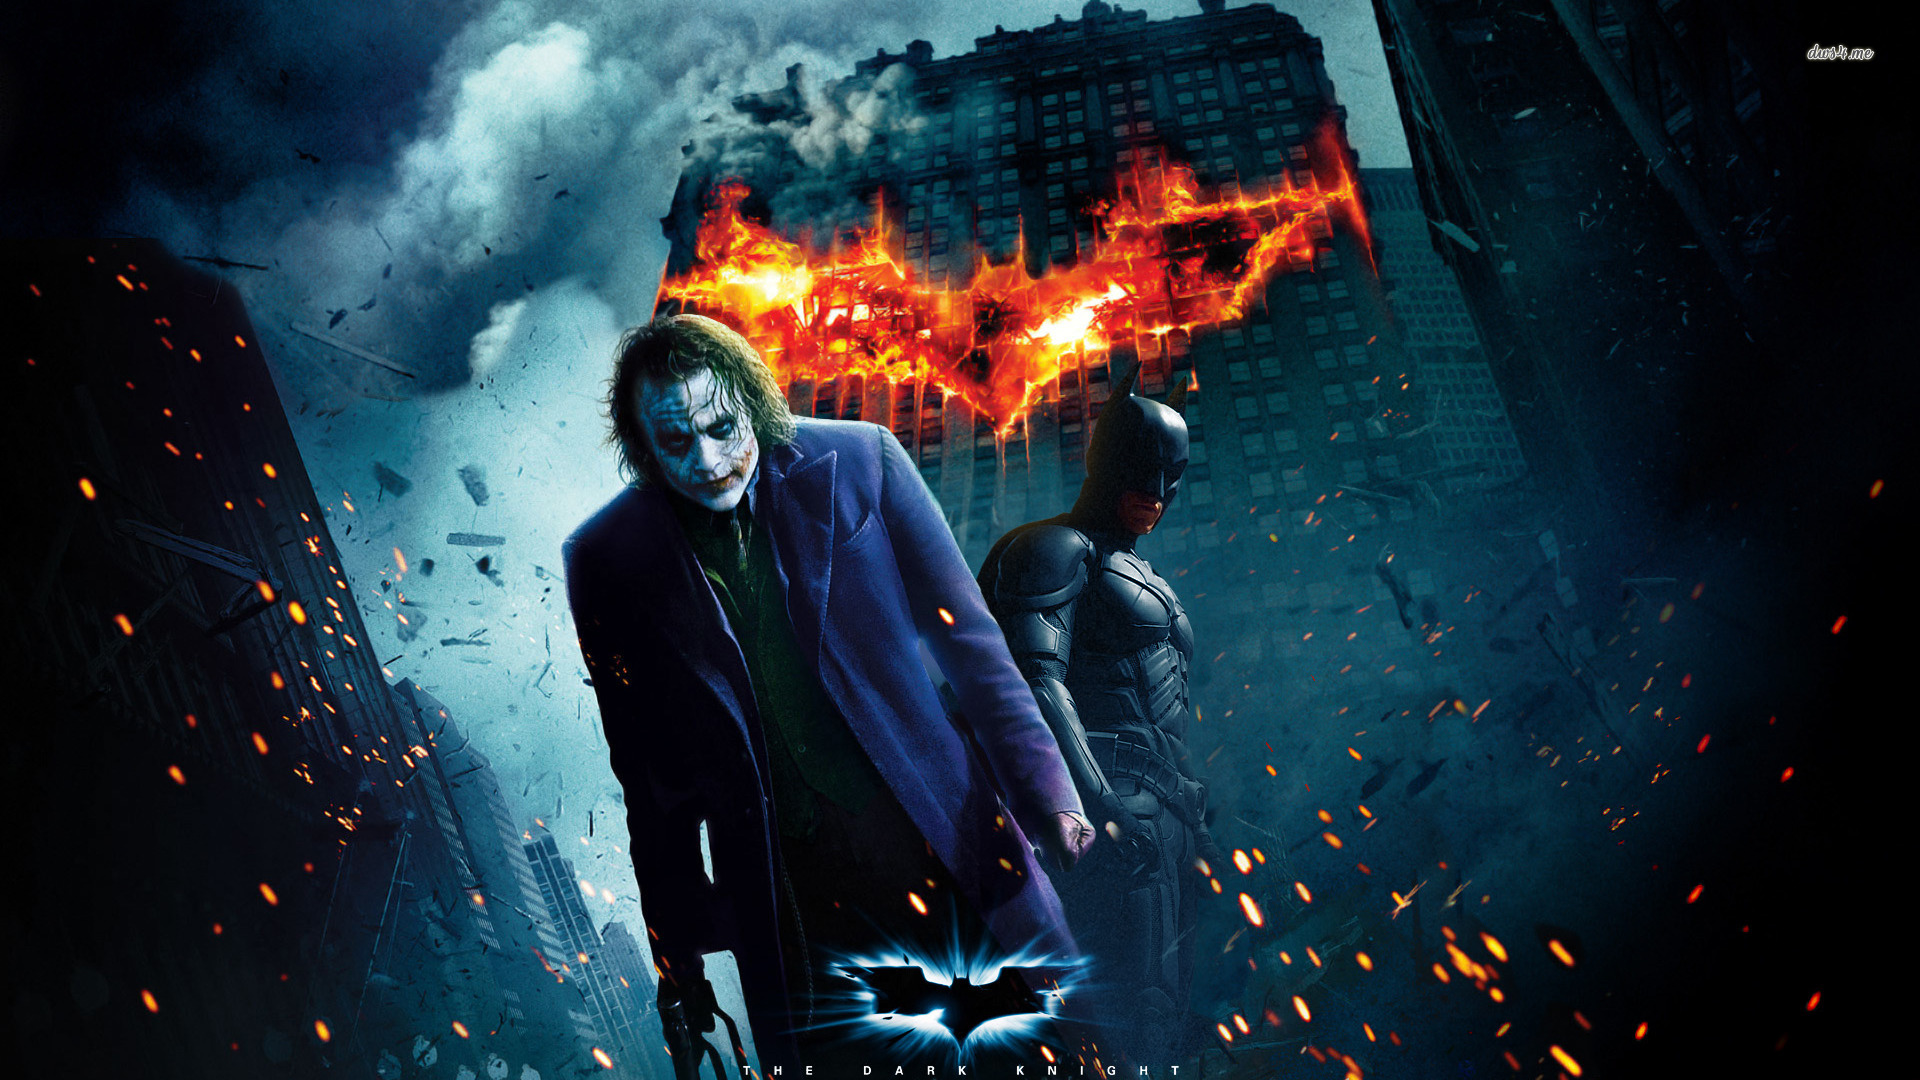 Download 85 Joker Wallpaper The Dark Knight The 1920x1080